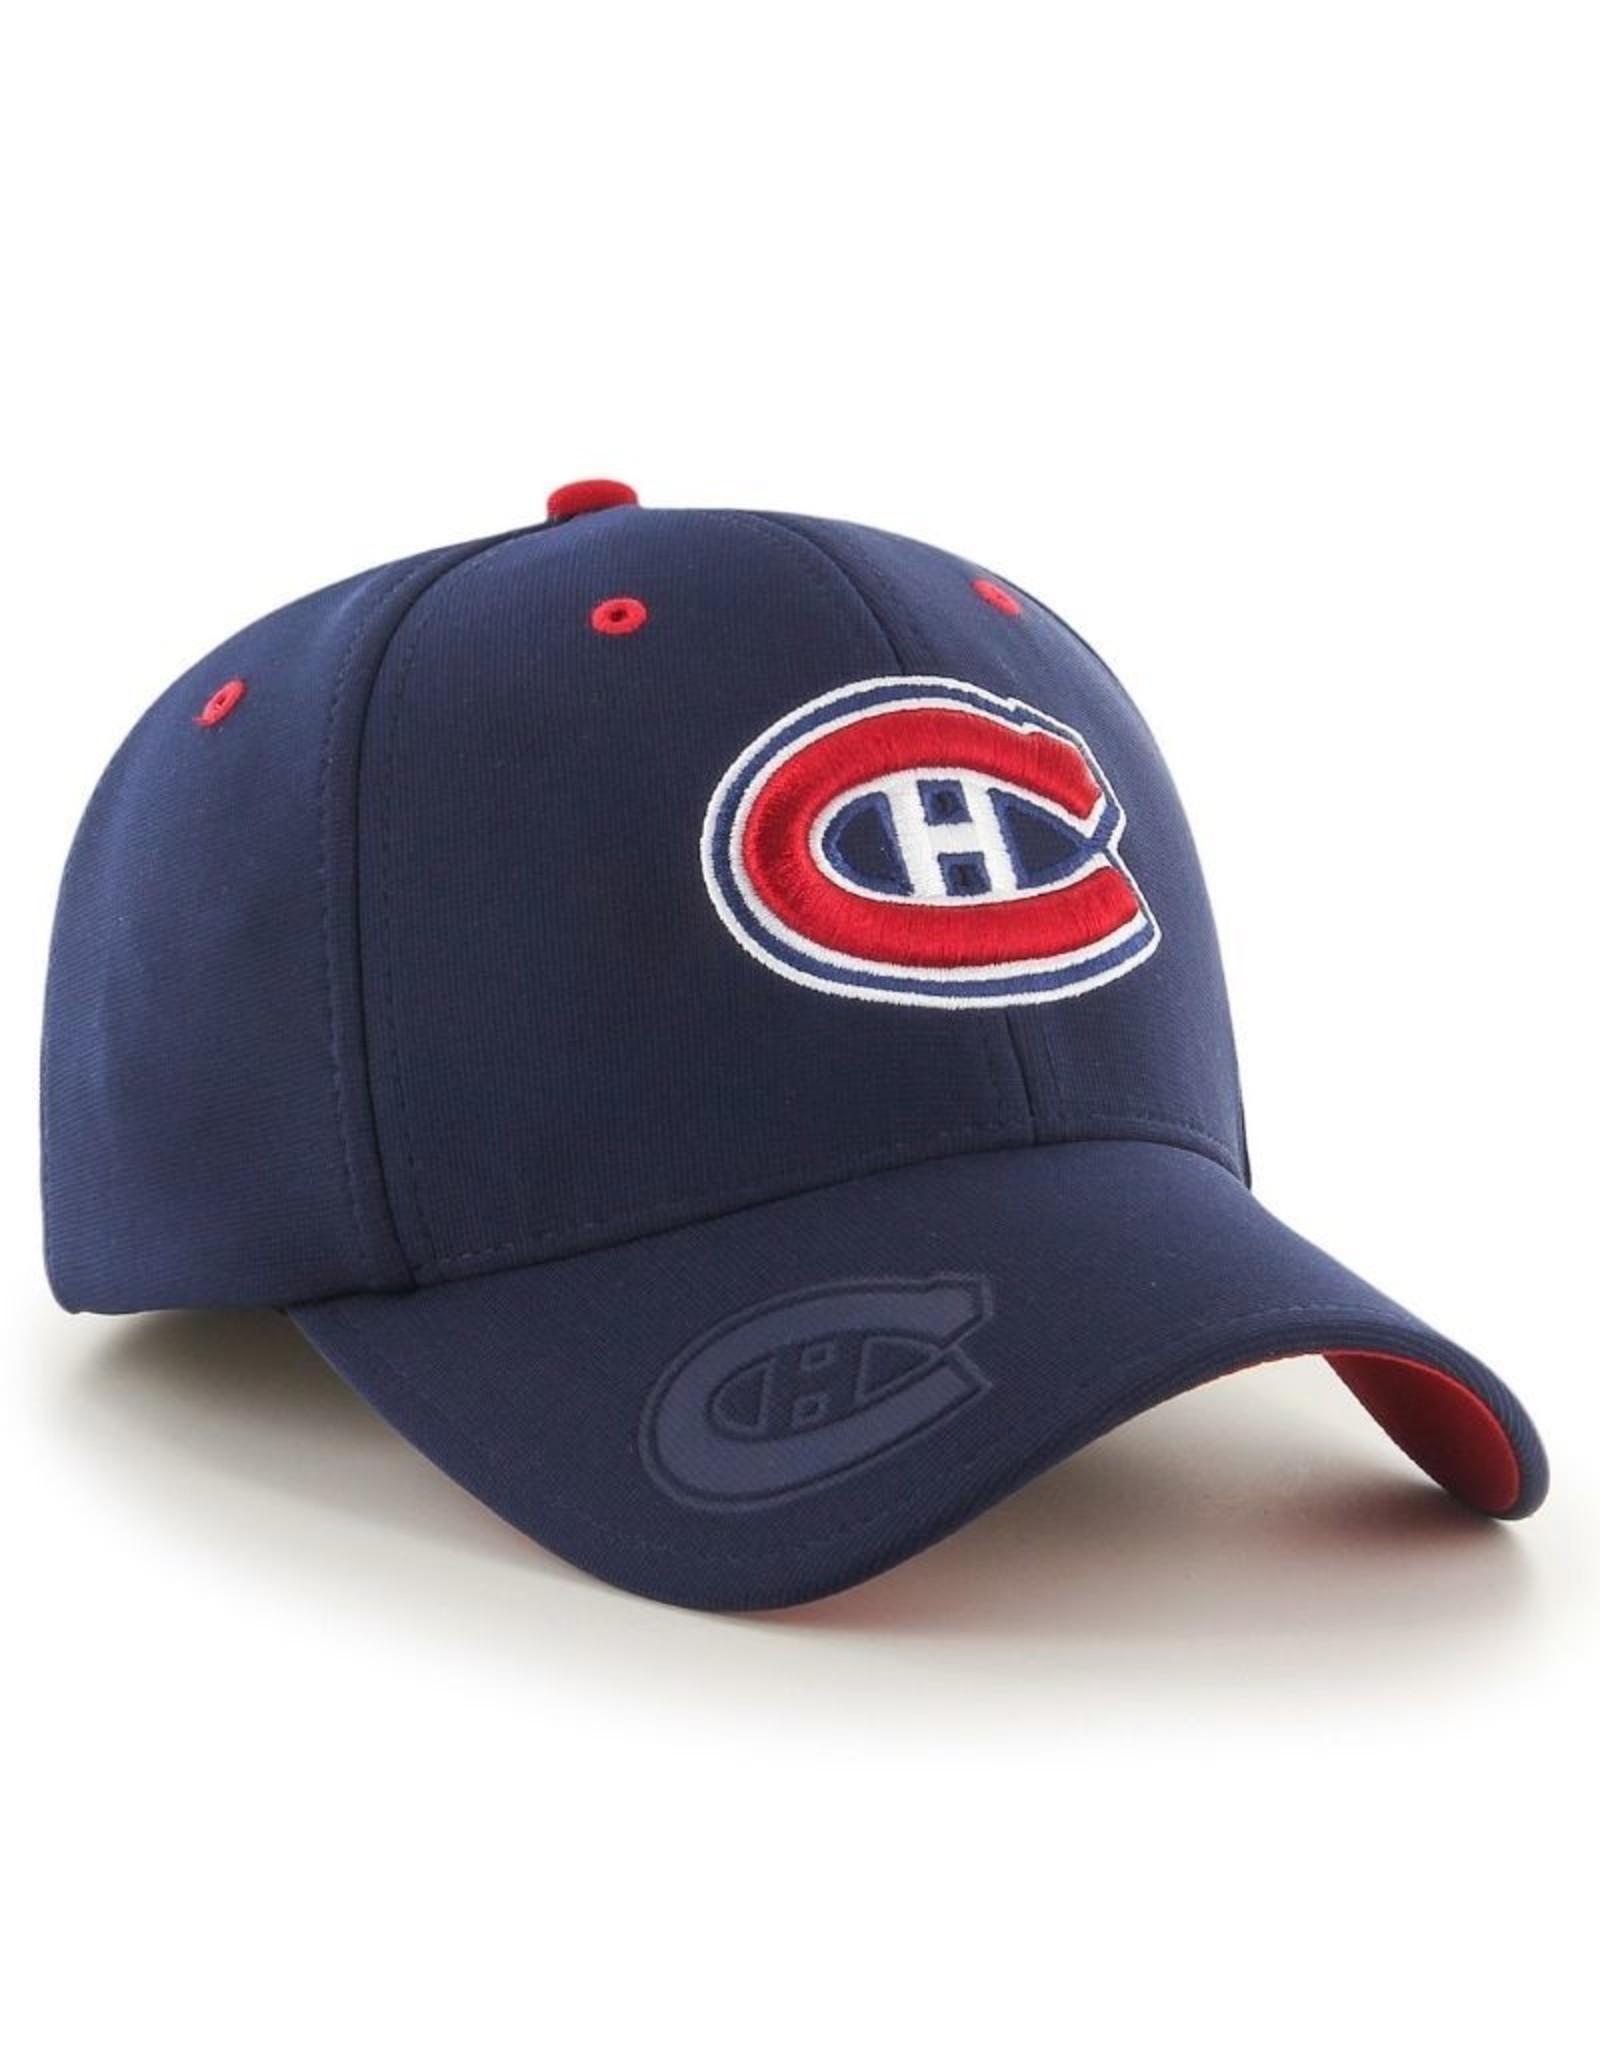 American Needle American Needle Men's E Boss Hat Montreal Canadiens Navy